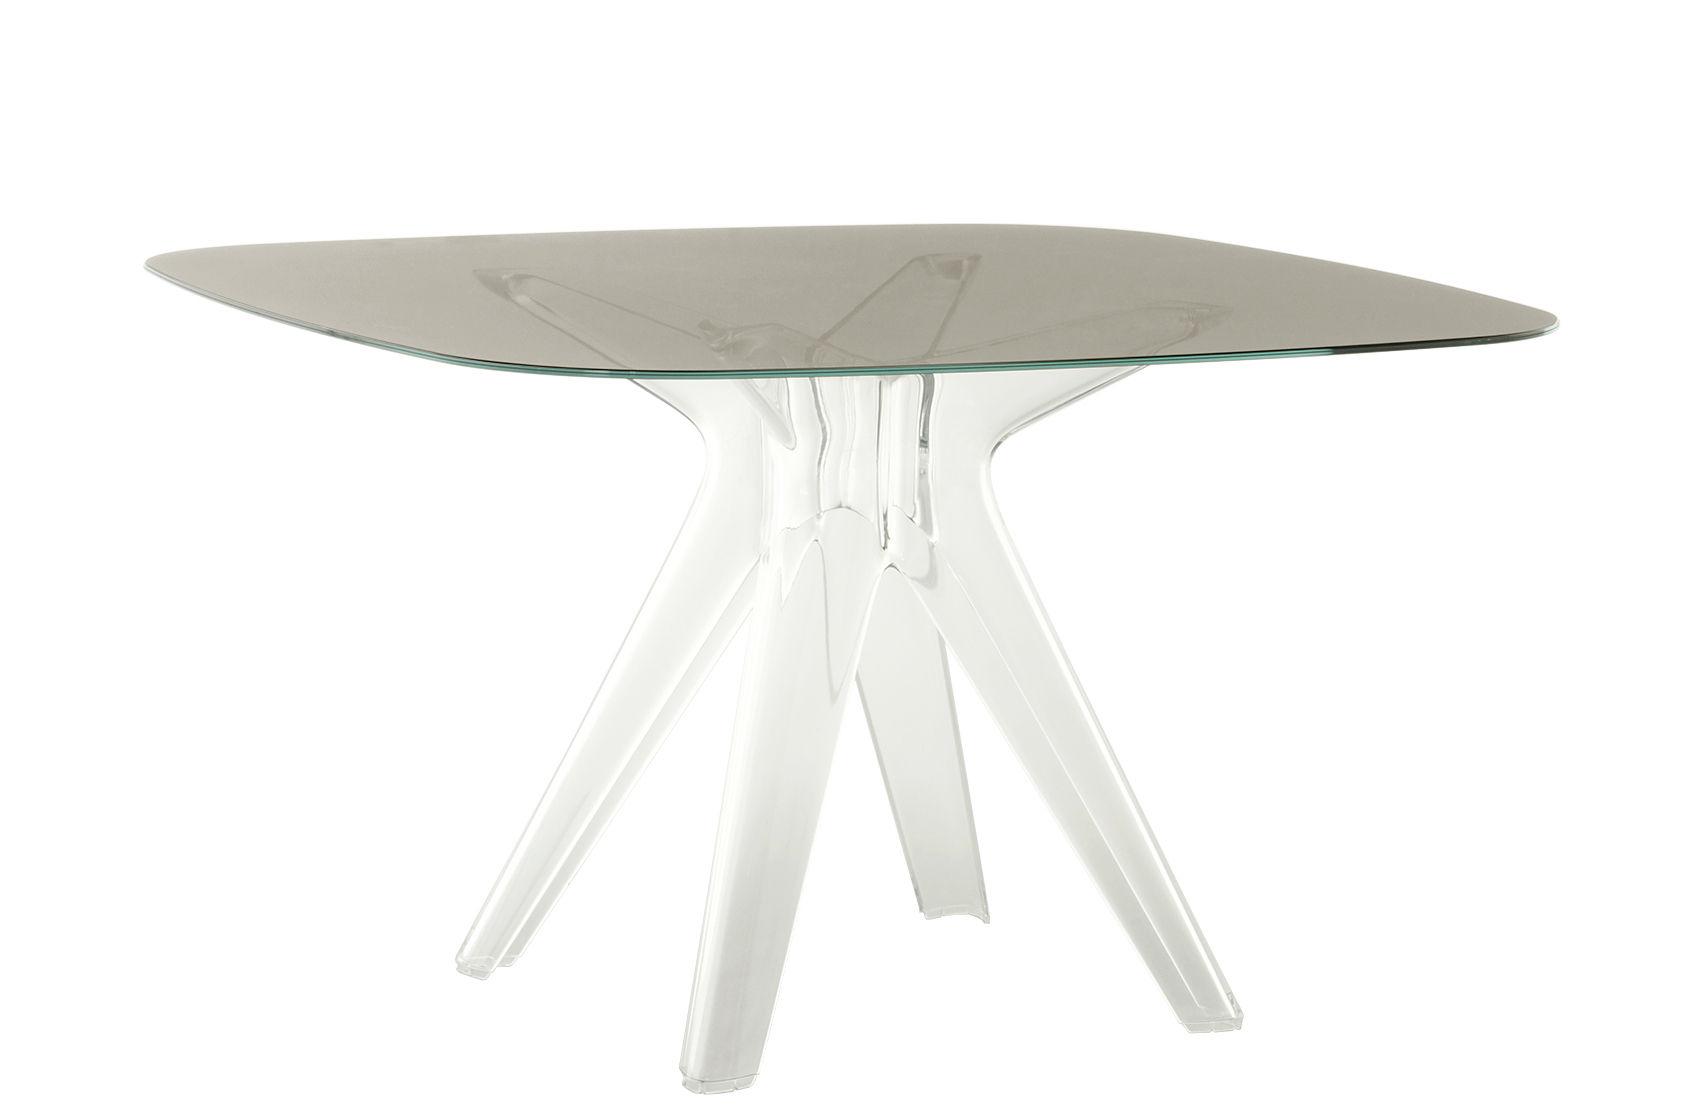 Arredamento - Tavoli - Tavolo quadrato Sir Gio - / Vetro - 120 x 120 cm di Kartell - Fumé / Piede trasparente - policarbonato, Vetro